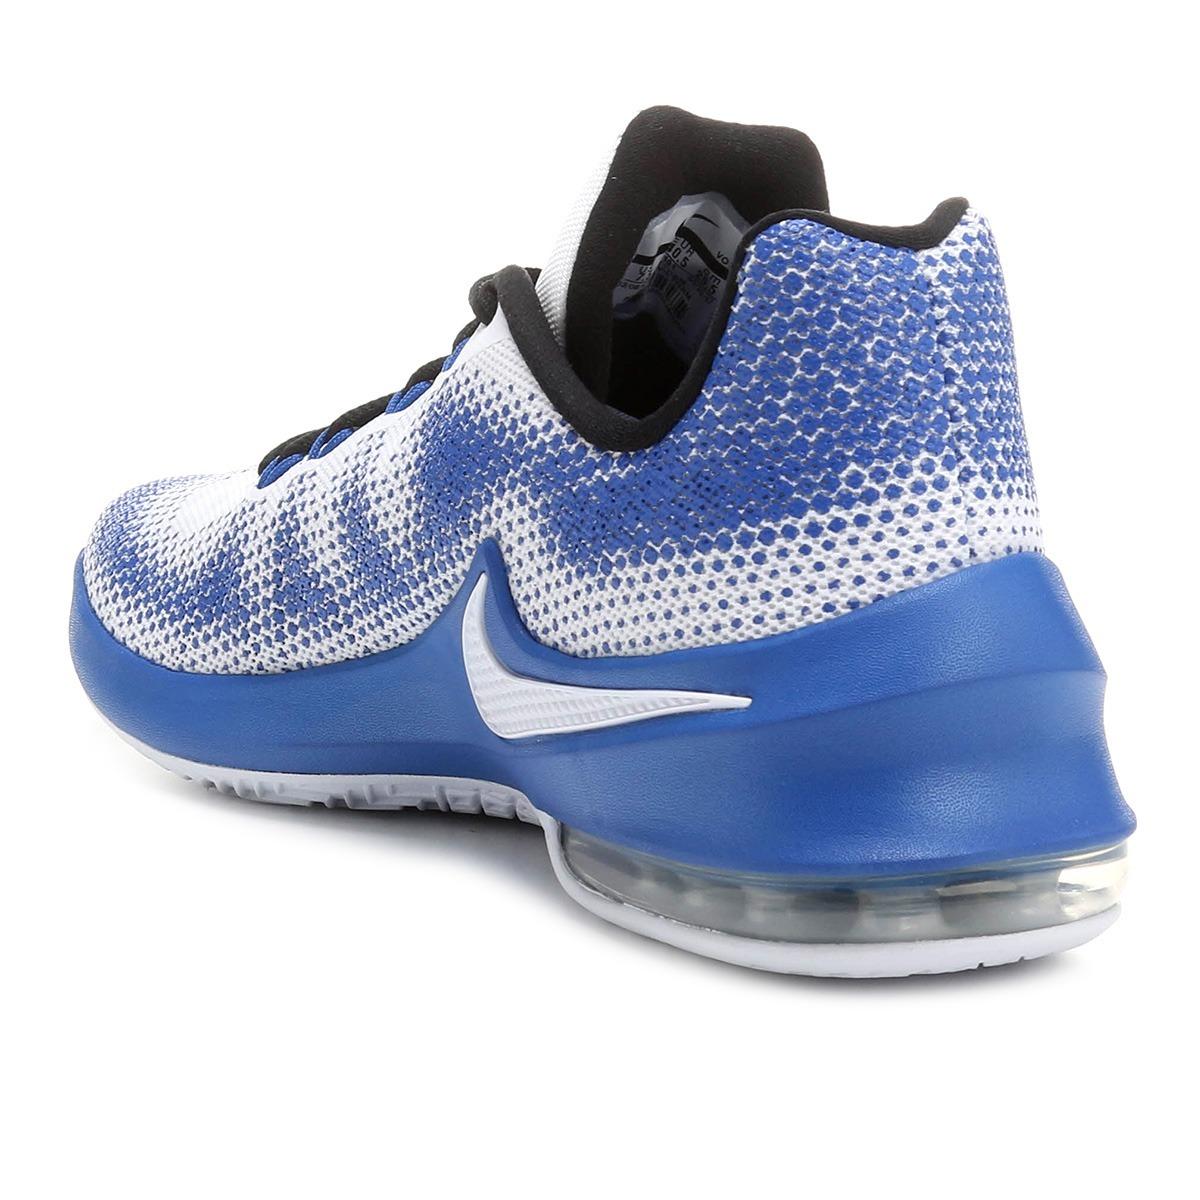 0d43106151d tênis nike air max infuriate low masculino - branco e azul. Carregando zoom.